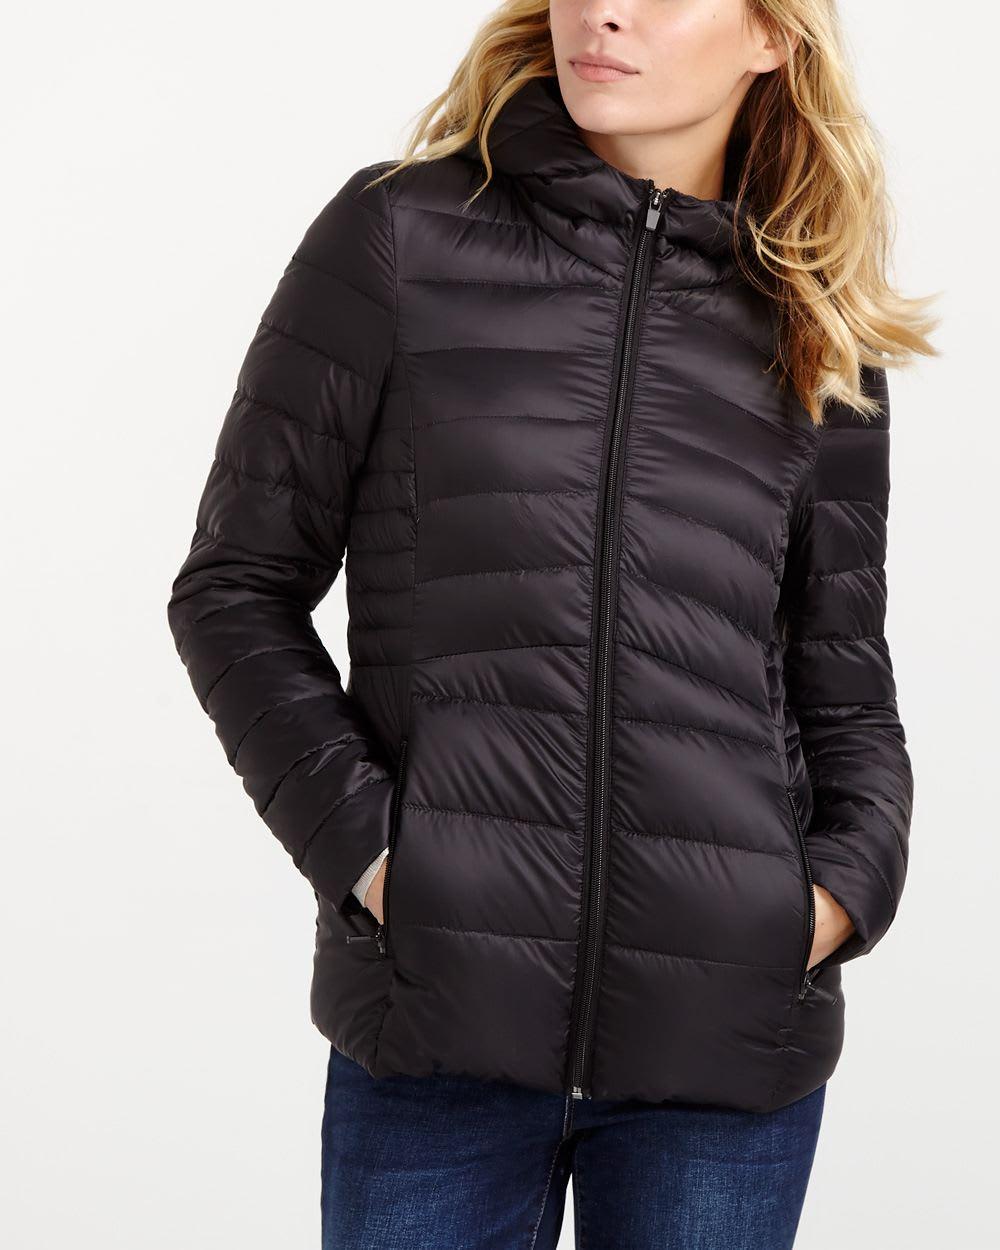 Packable down jacket women